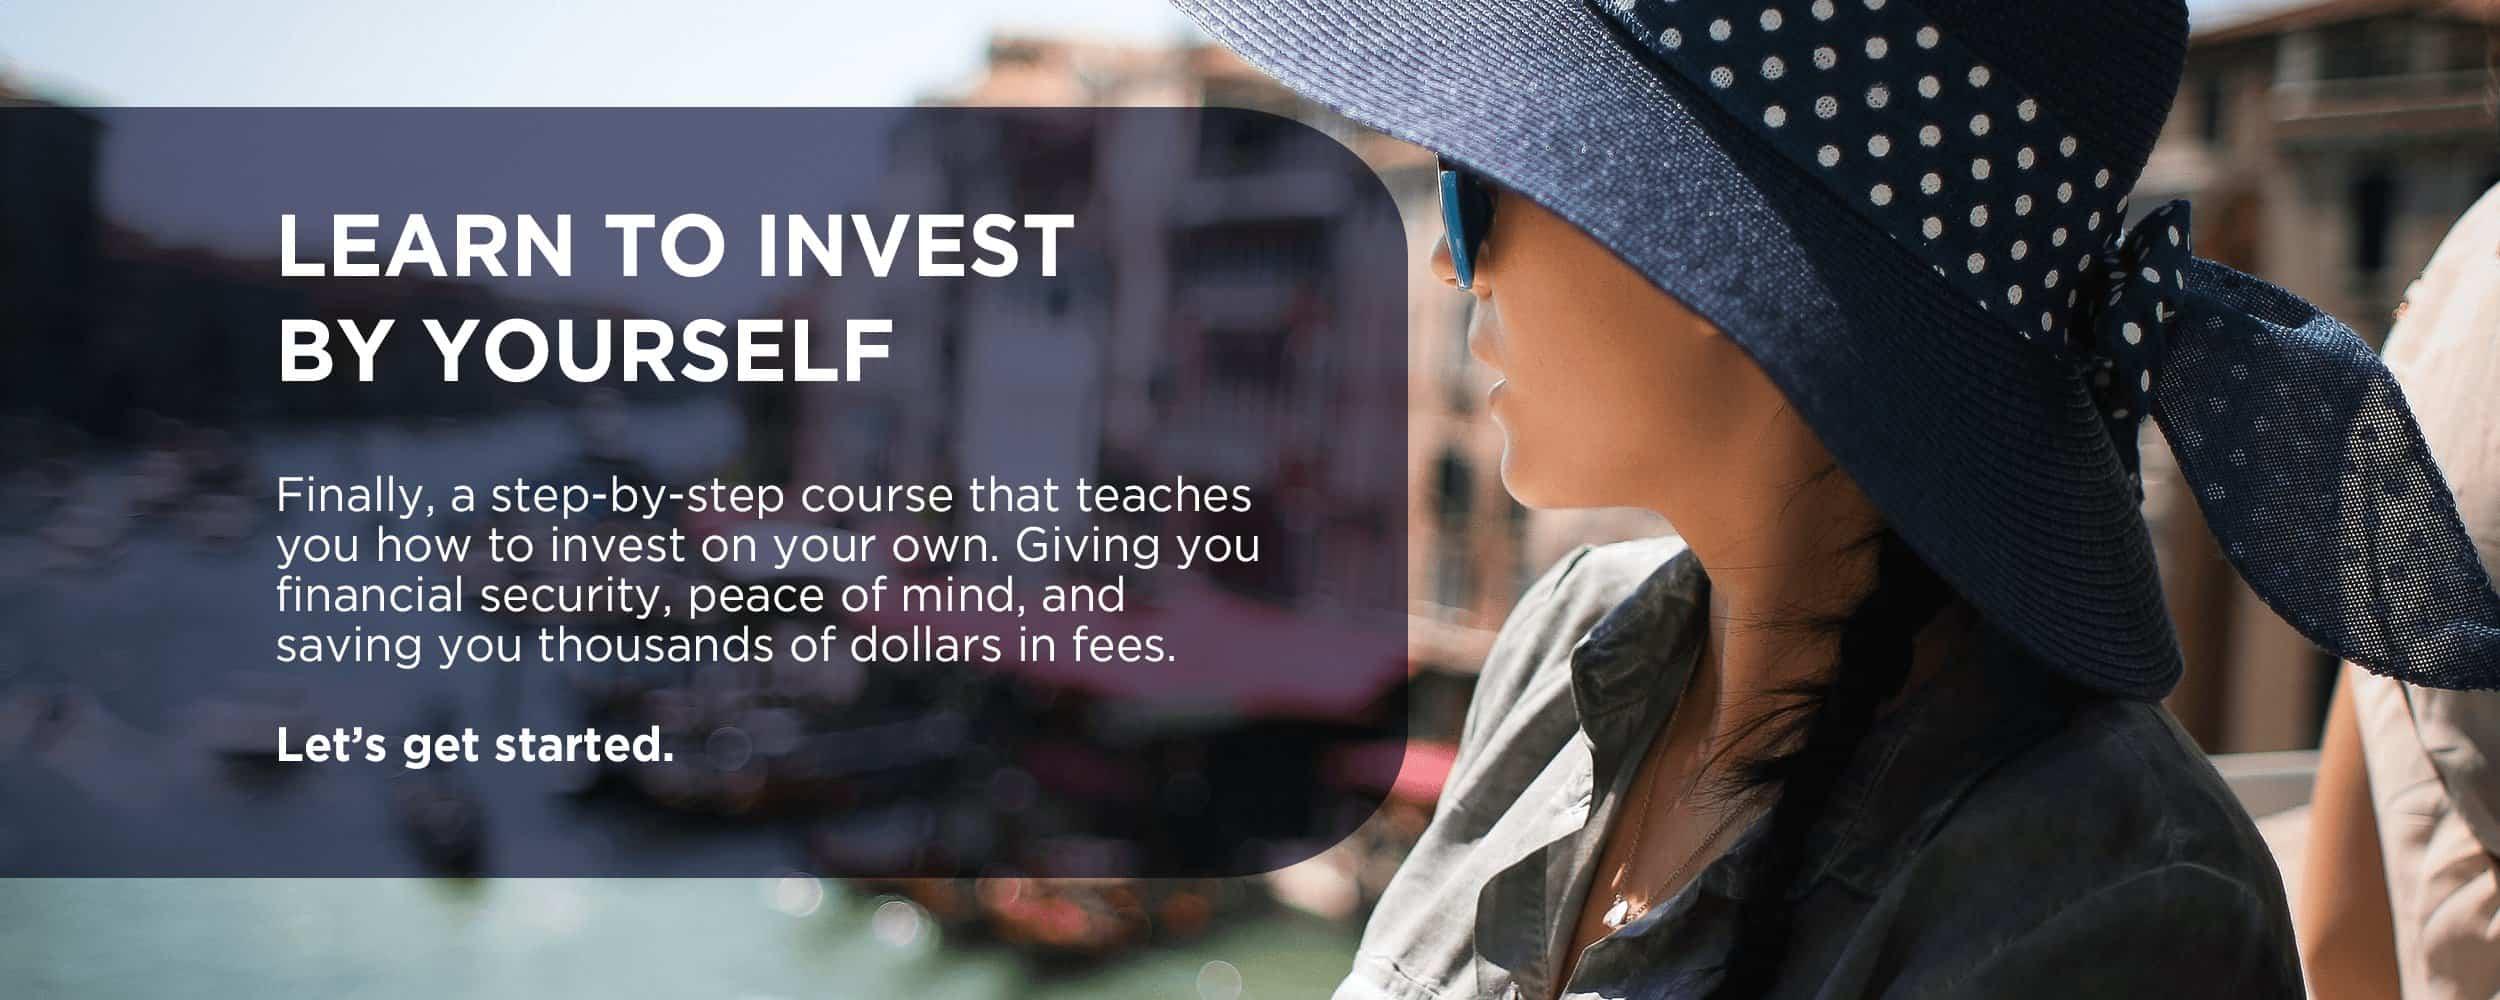 DIY Investing Course Canada